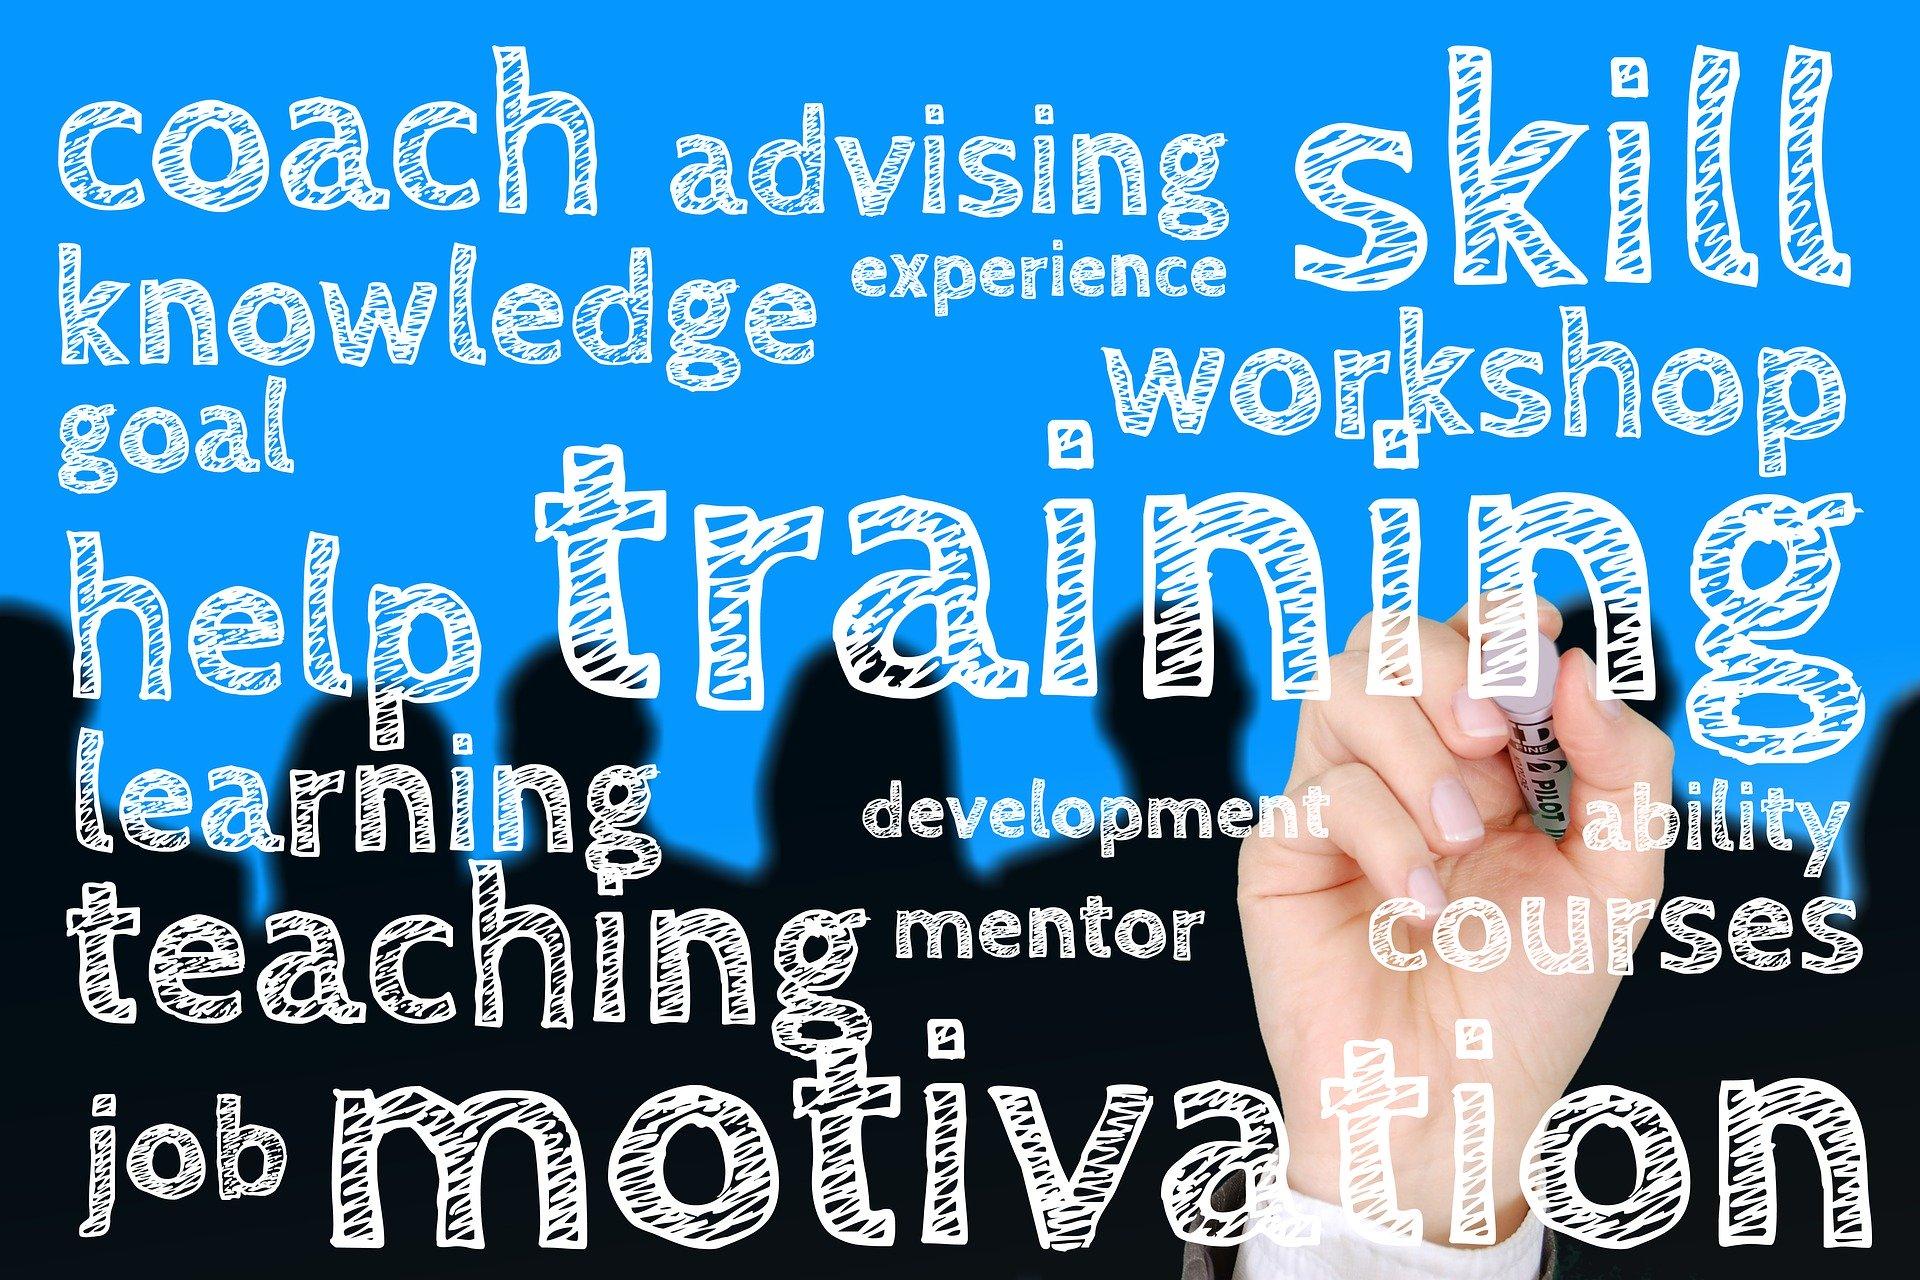 PR skills training: why it matters